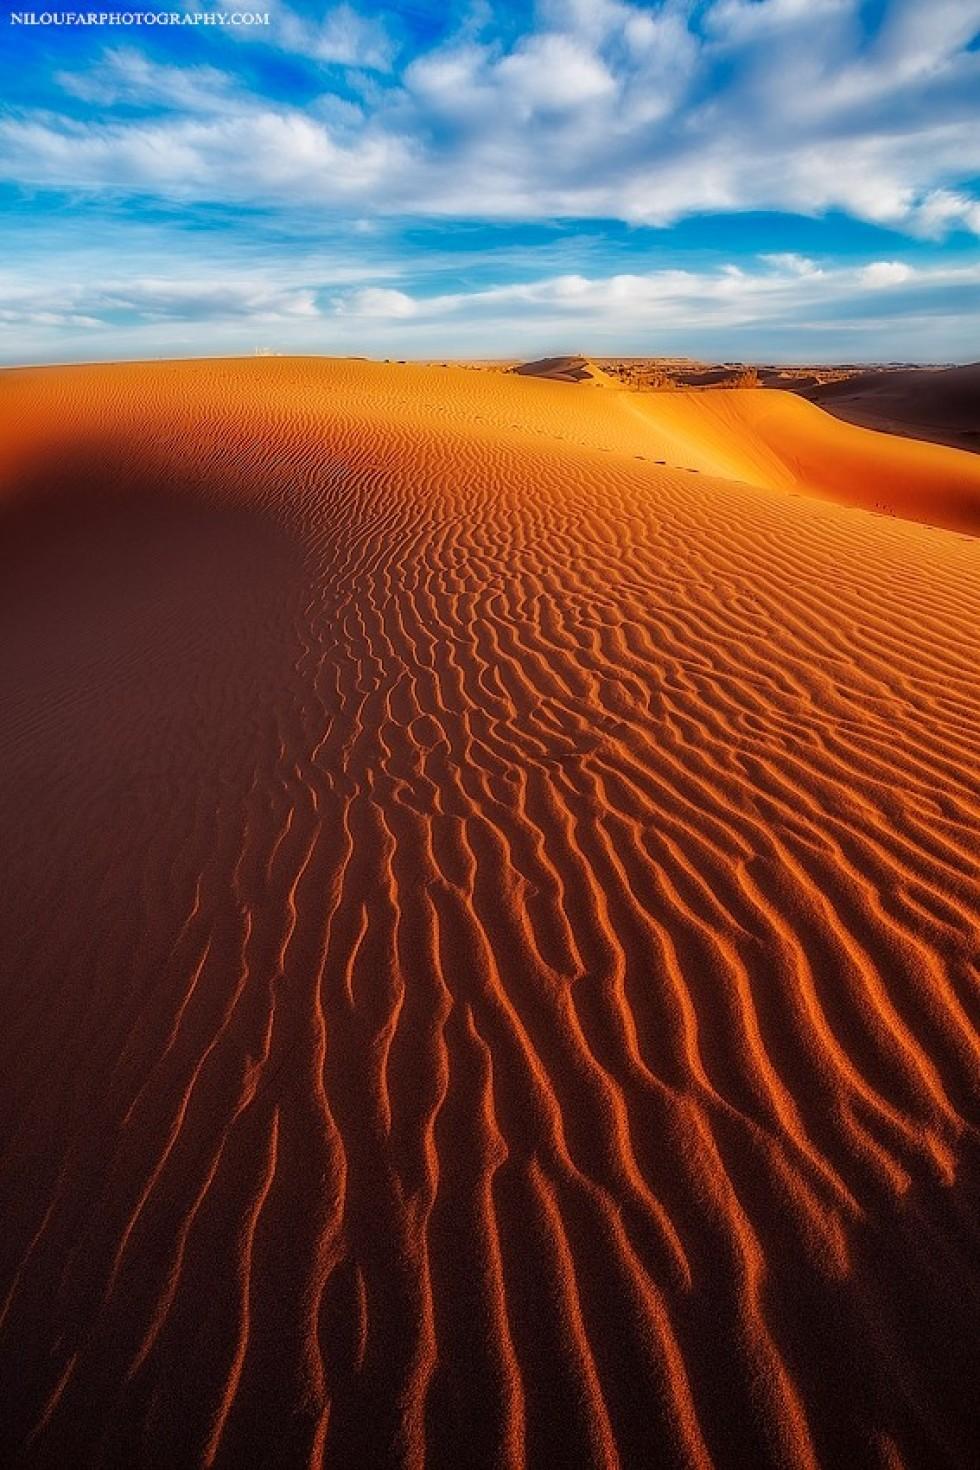 Хвилястий шлях. Фото: Niloufar Hosein zadeh